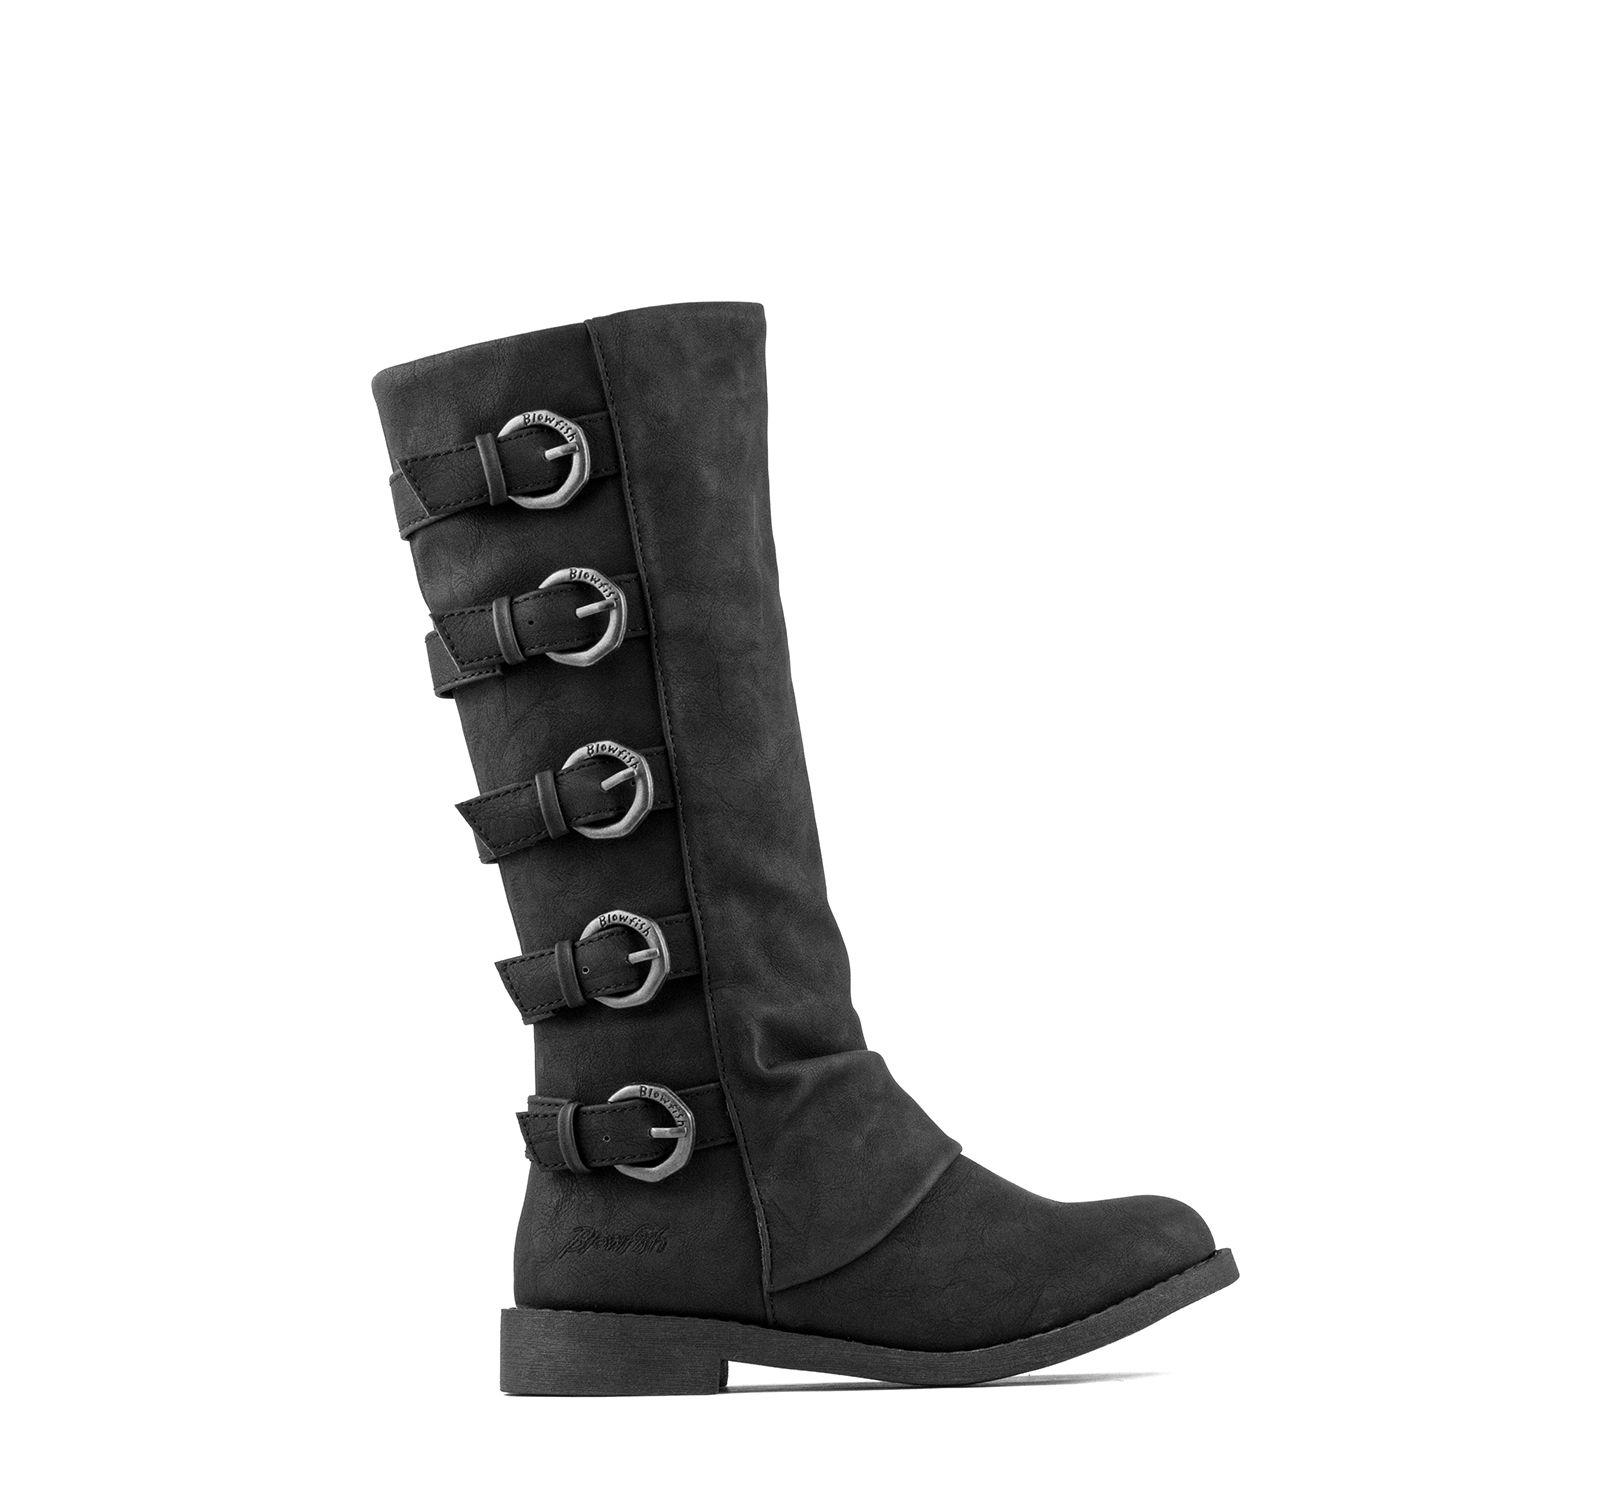 0a498ce0cad Blowfish Takara Tall Boot Girls - Black